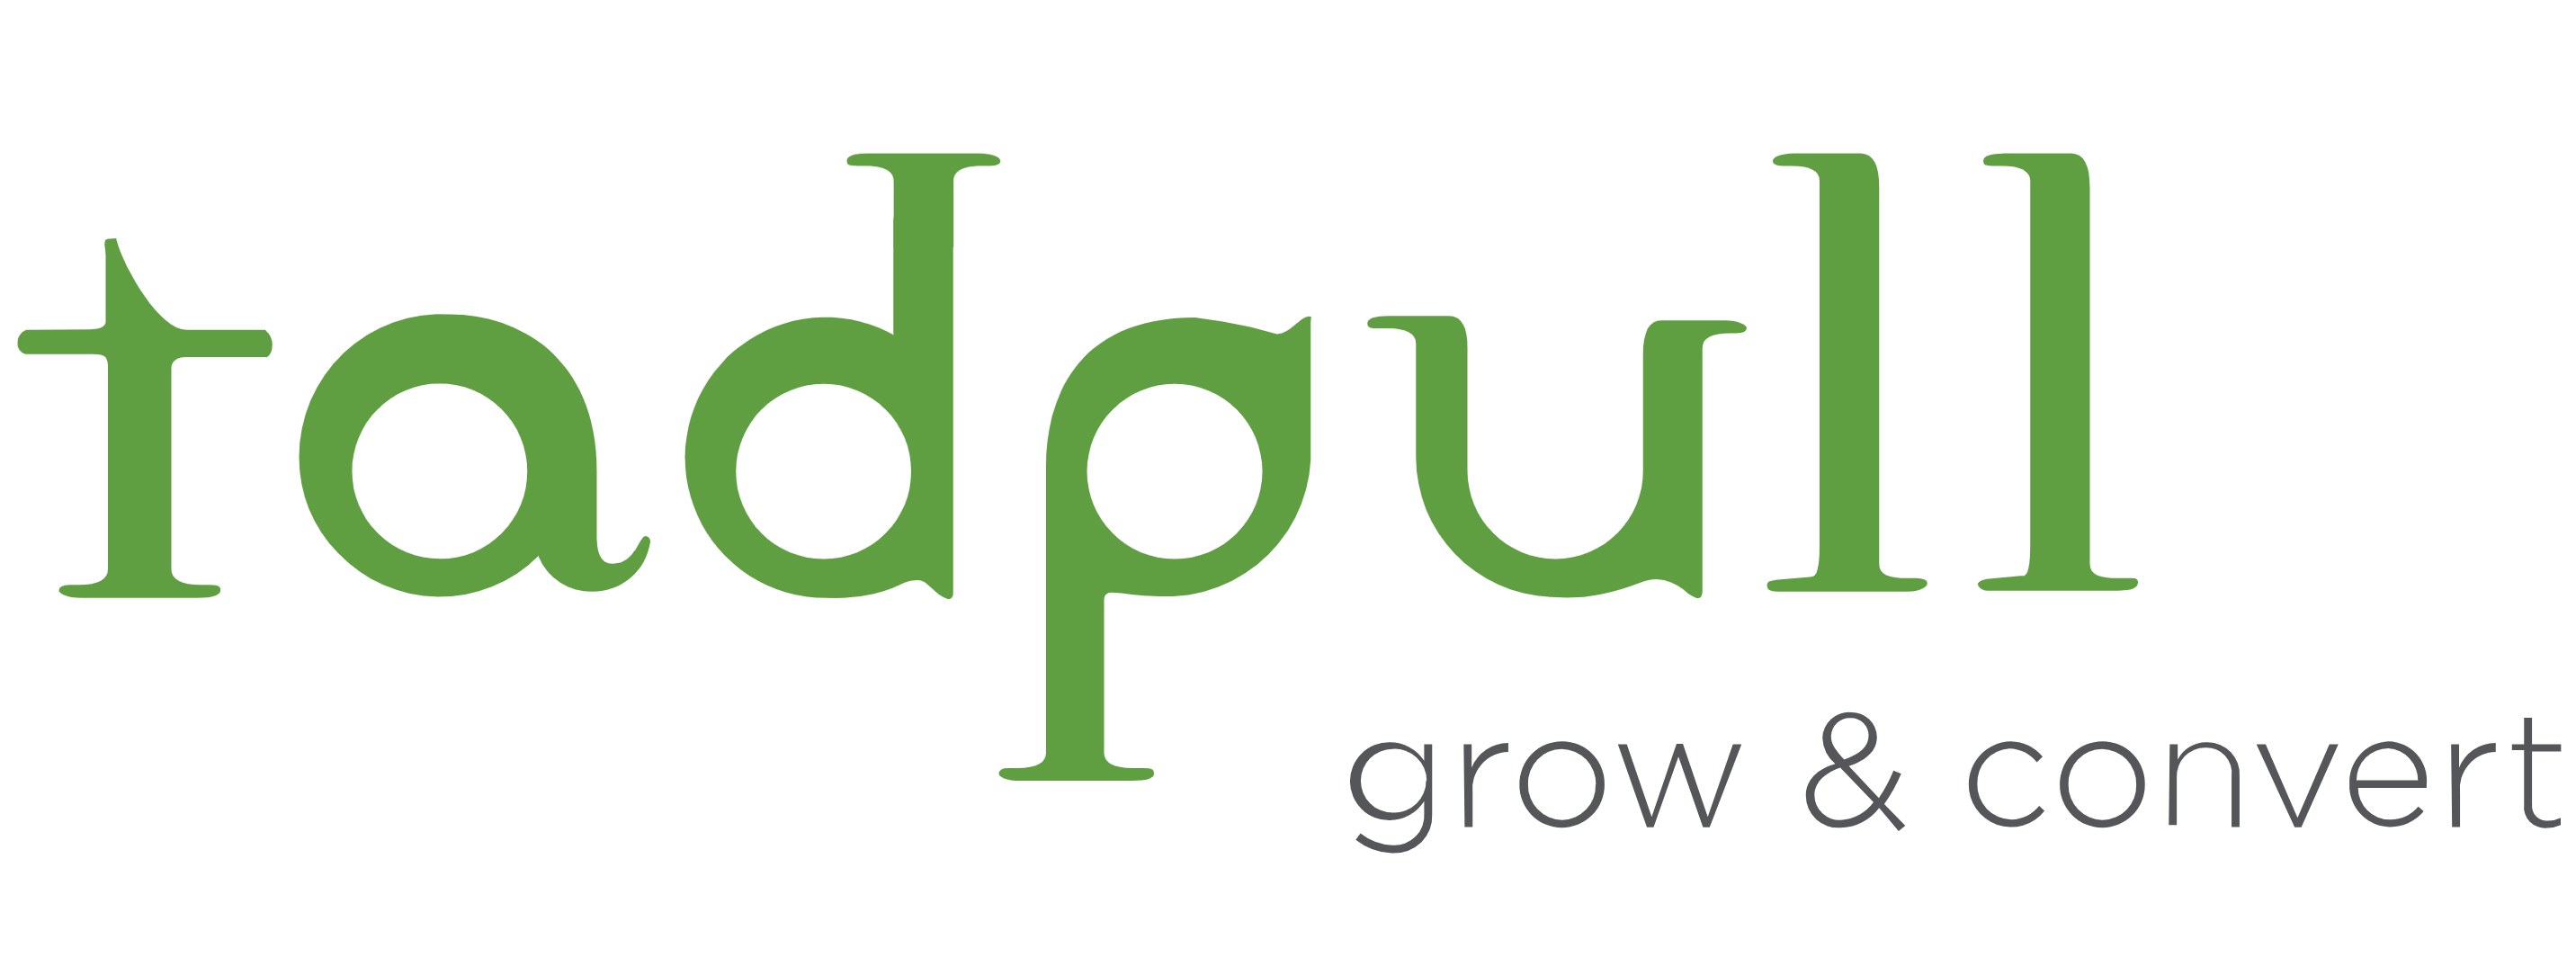 Tadpull Grow & Convert - Digital Marketing Company